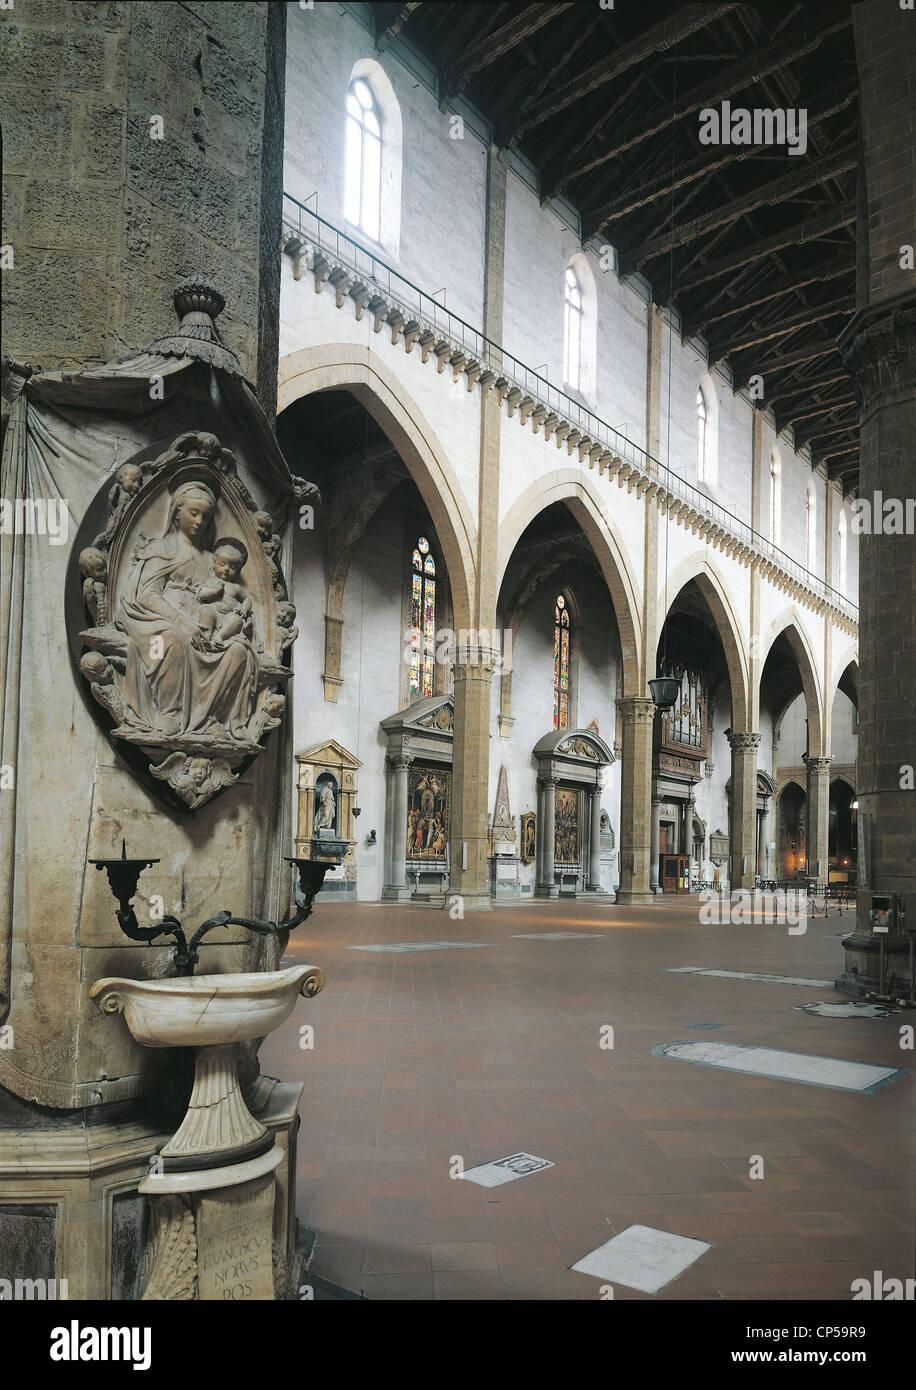 Tuscany, Florence. Arnolfo di Cambio (1245-1302), Holy Cross. AISLE LEFT INSIDE. XIII-XIV CENTURY GOTHIC ARCHITECTURE - Stock Image